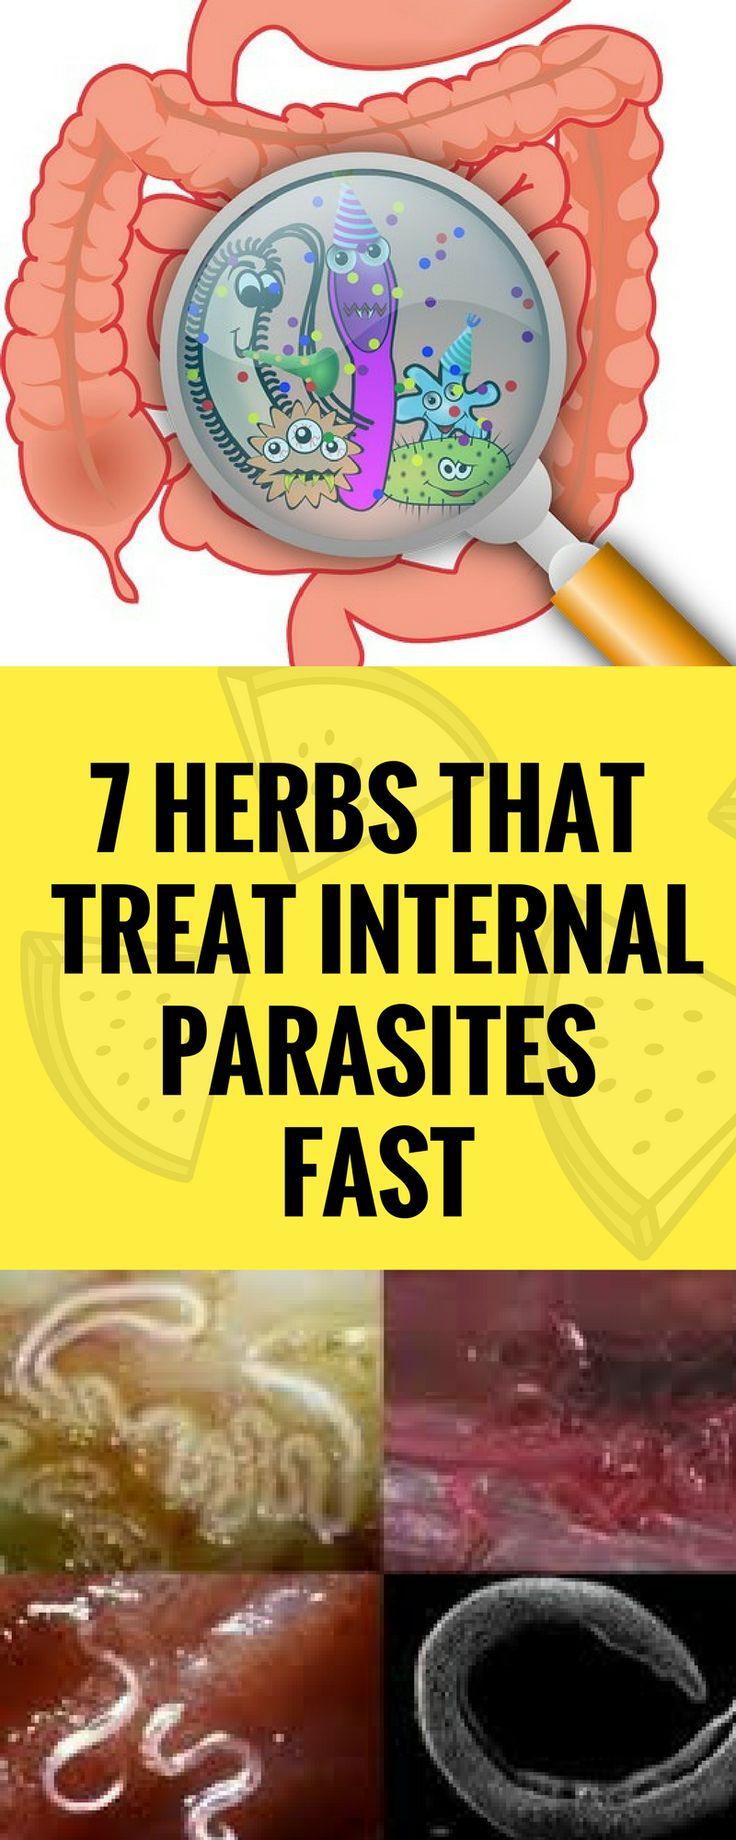 7 HERBS THAT TREAT INTERNAL PARASITES FAST`  ``